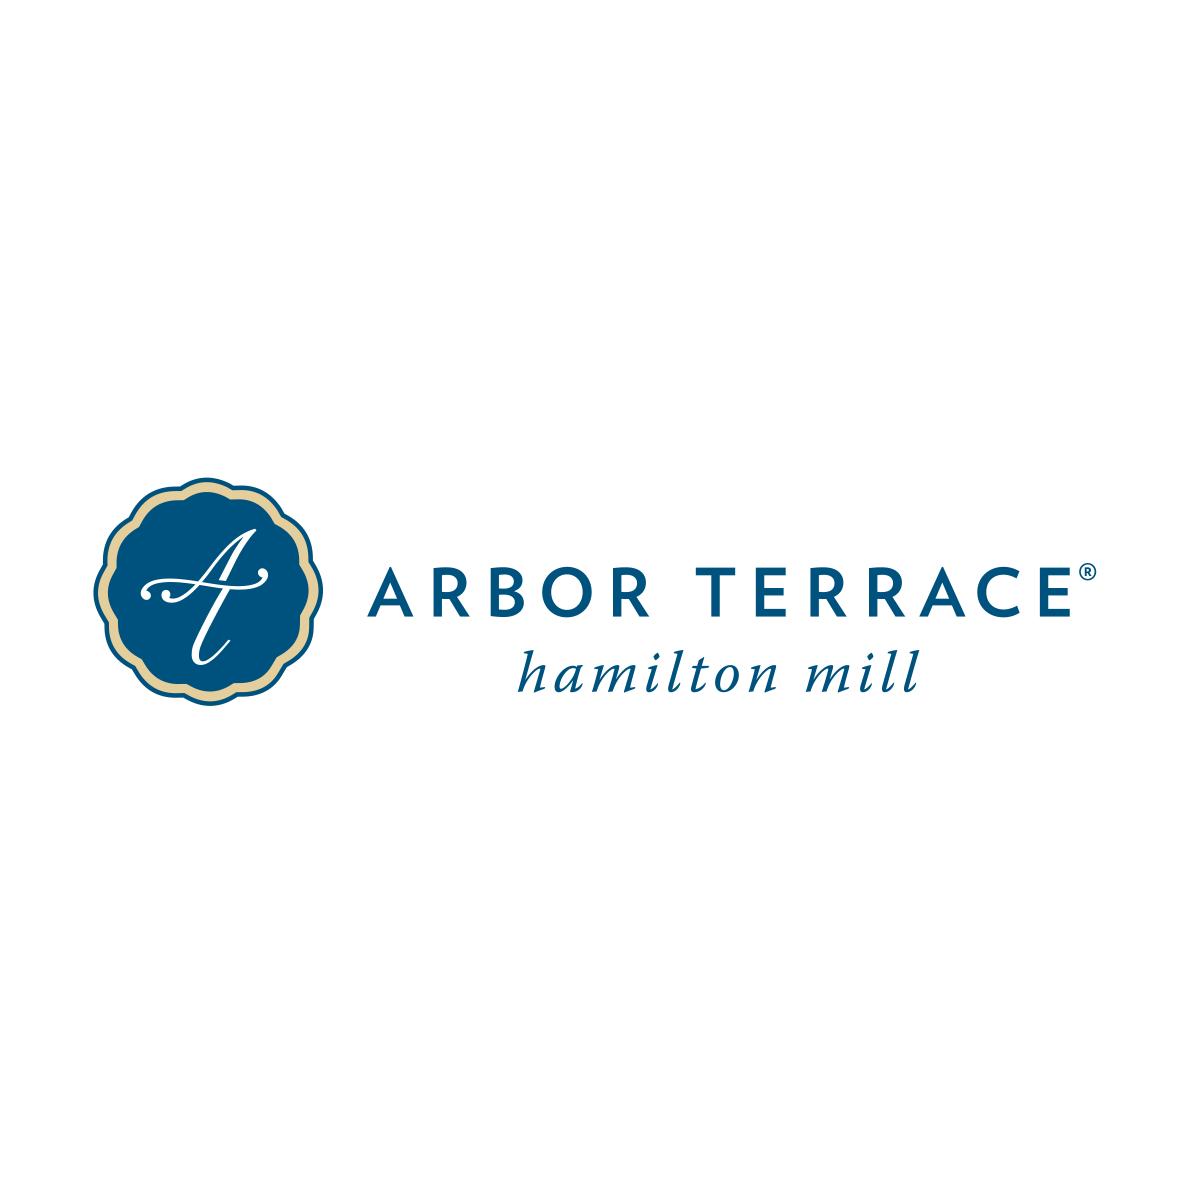 Arbor Terrace Hamilton Mill image 5